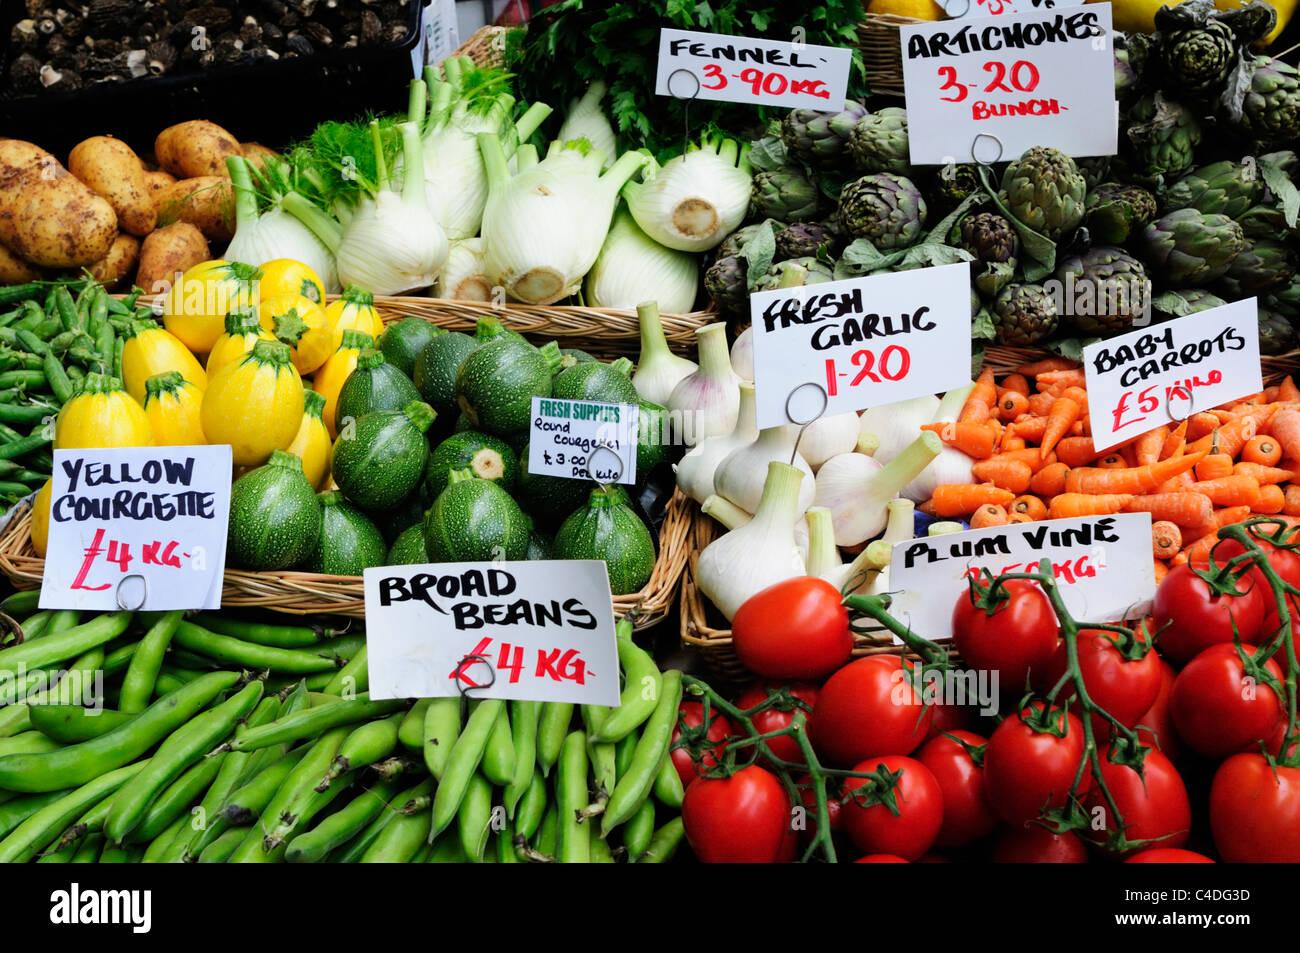 Vegetable Stall Display at Borough Market, Southwark, London, England, Uk Stock Photo